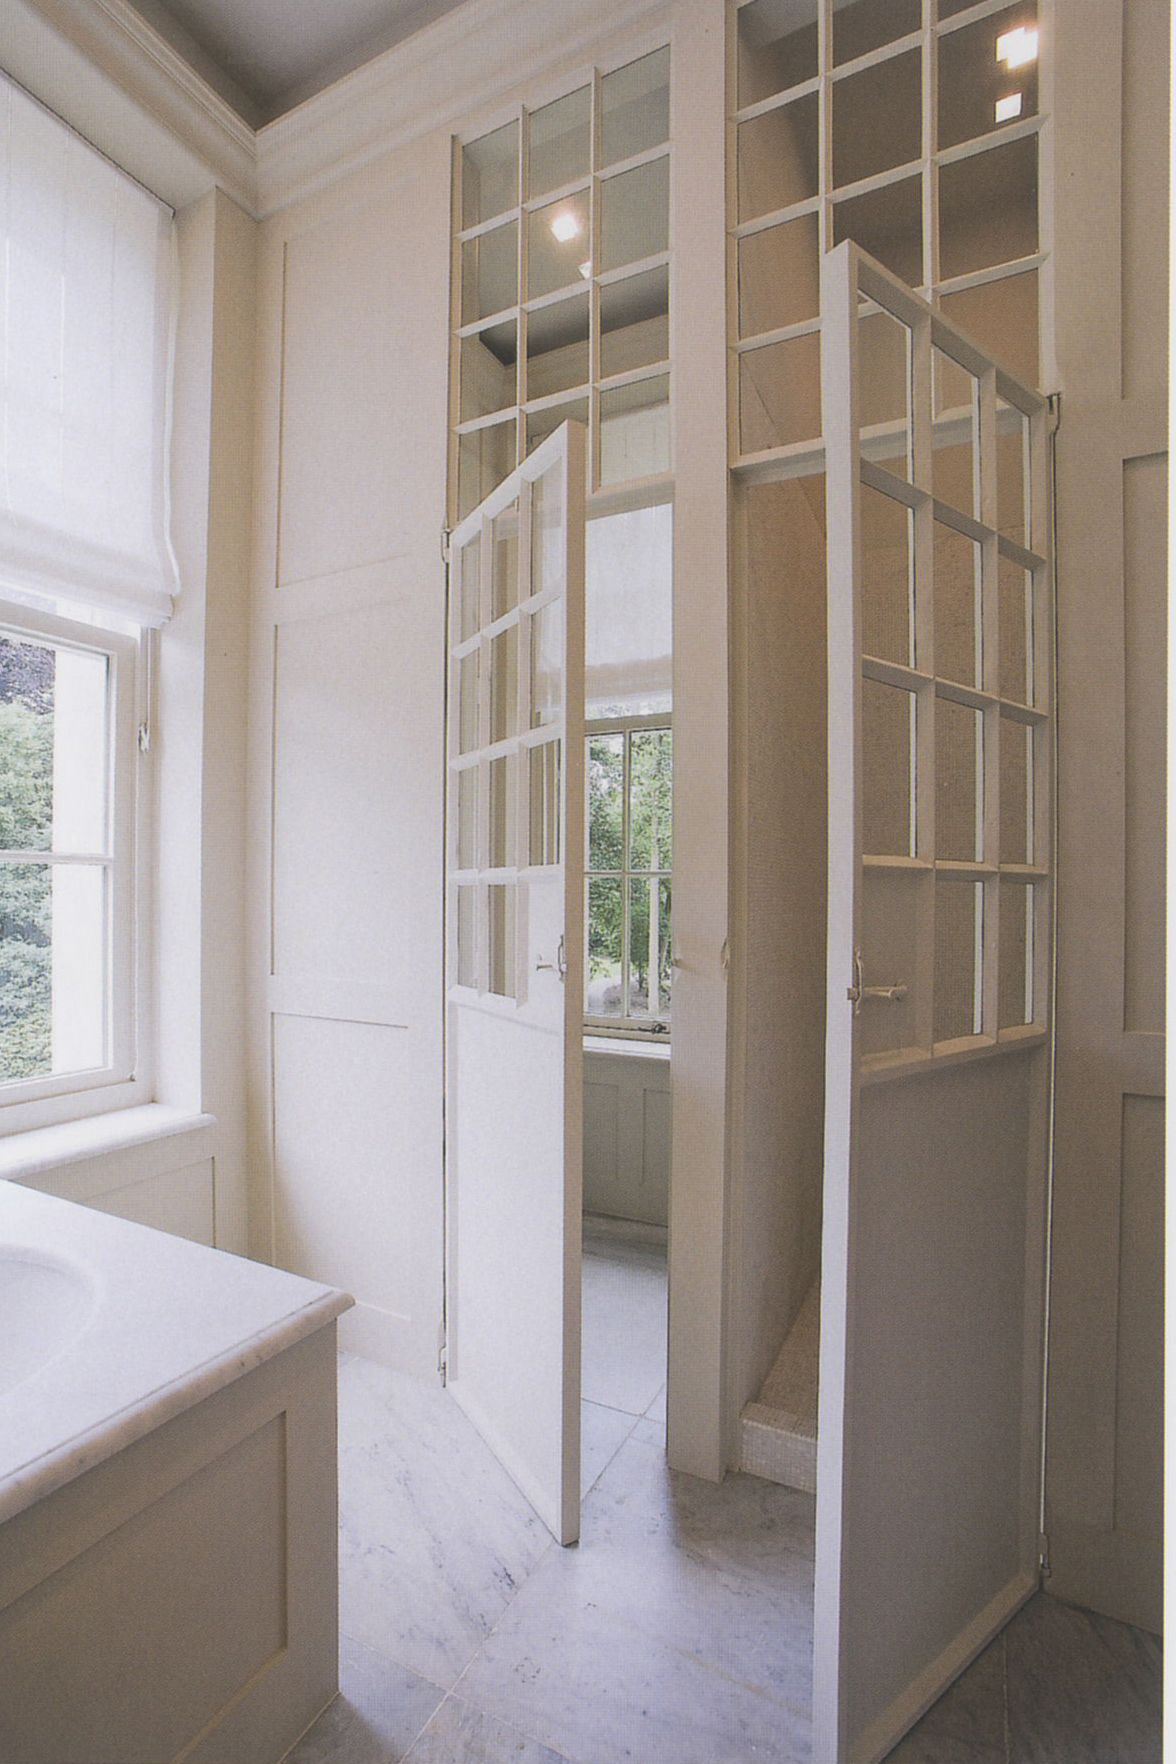 Doors kick start your weight loss today with www - Interior door with window on top ...